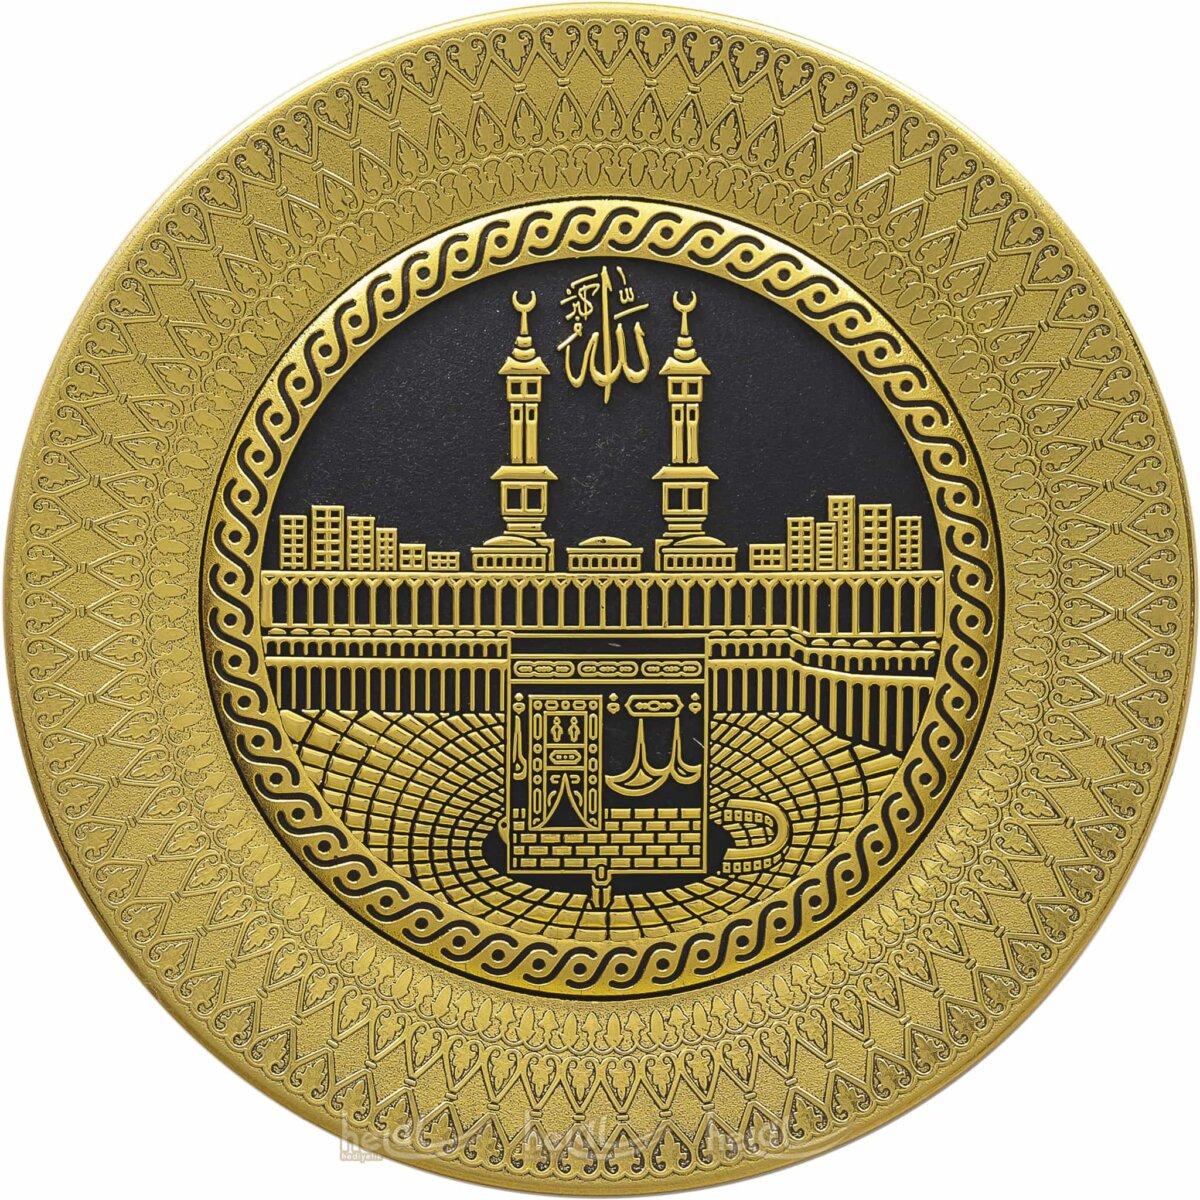 21cm Kabe-i Şerif Mekke Hac Dini Hediyelik Tabak Duvar Dekorasyonu Kabe